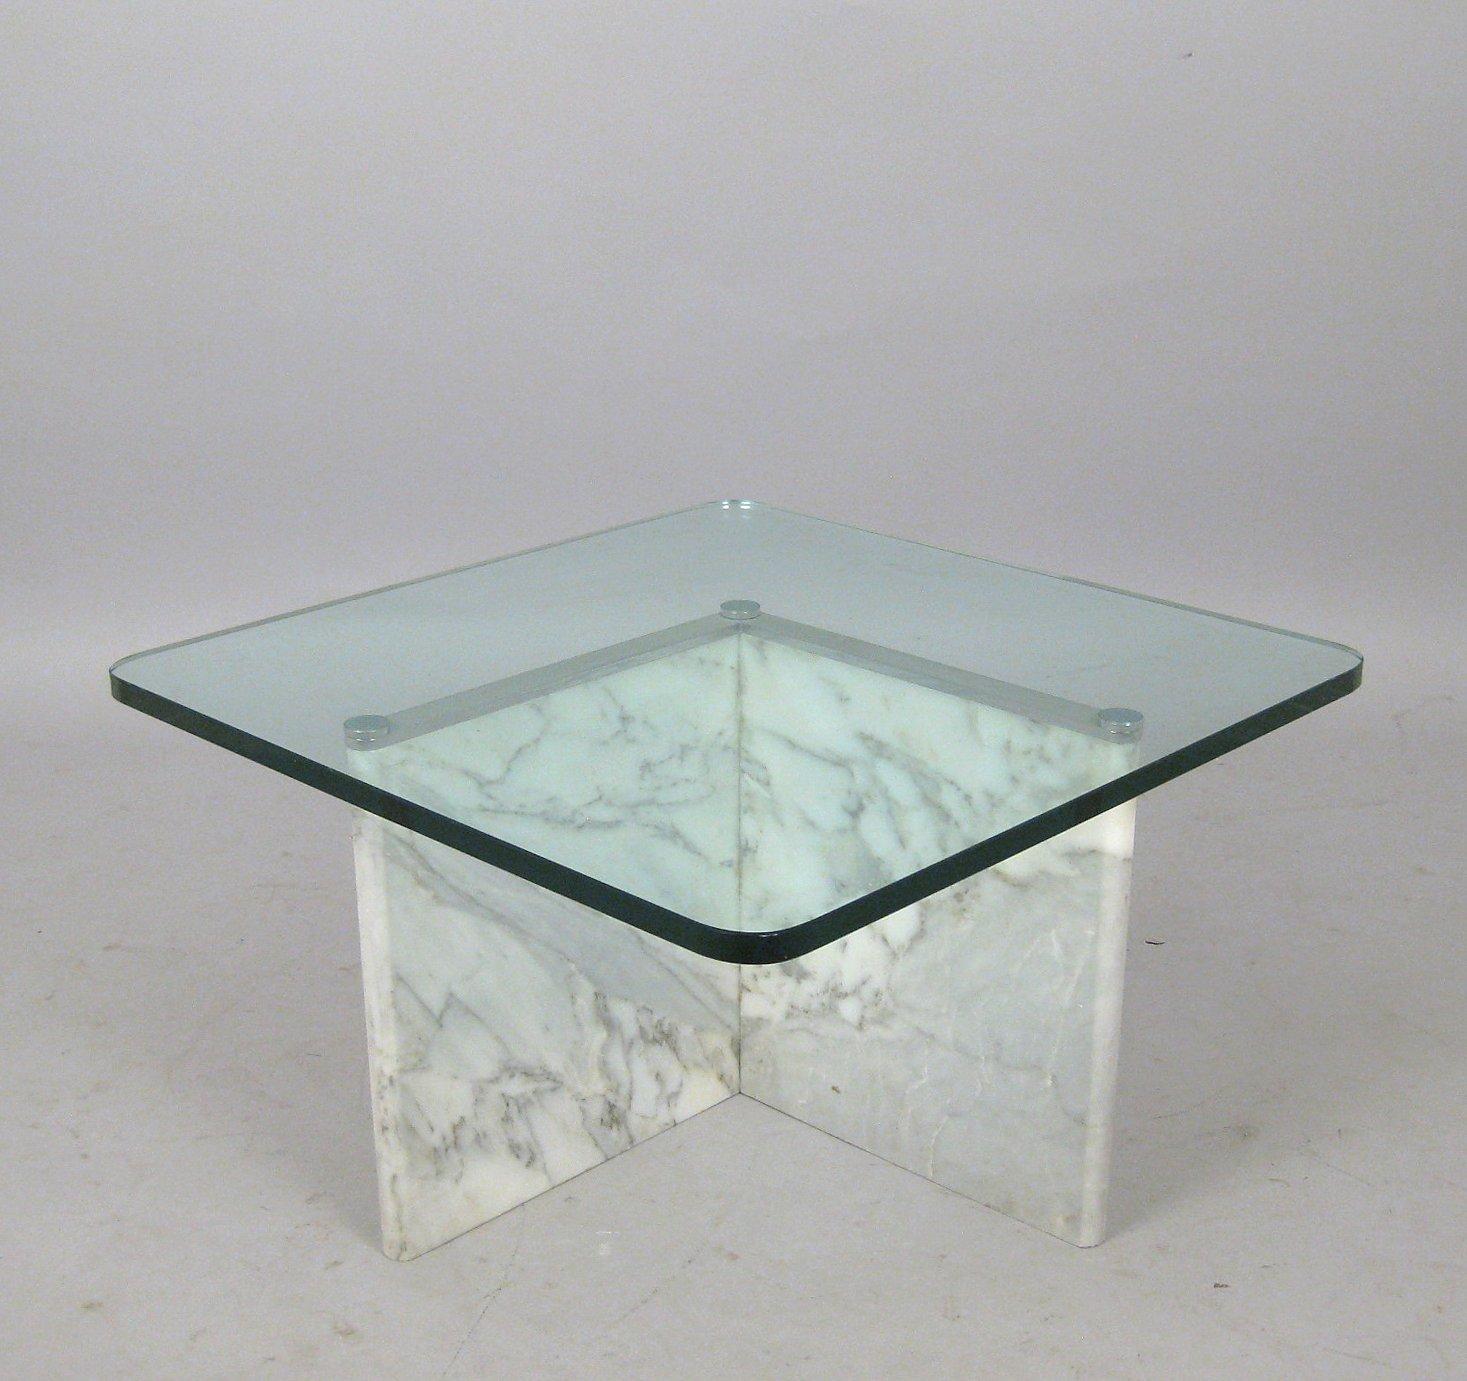 Auktionstipset for Sofatisch marmor